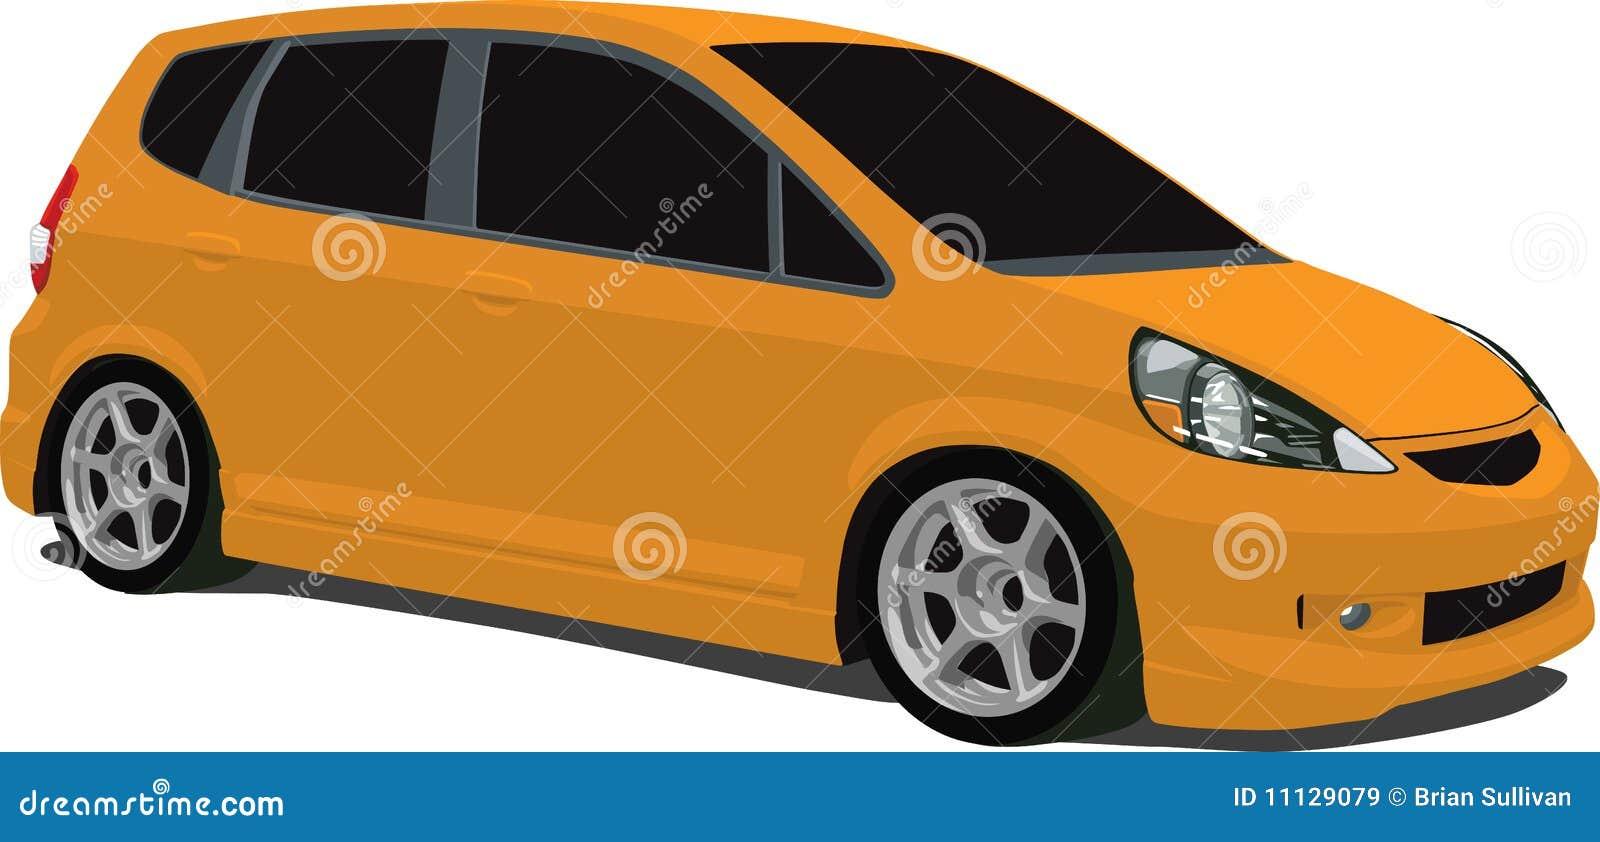 Orange honda fit royalty free stock images image 11129079 for Orange honda fit